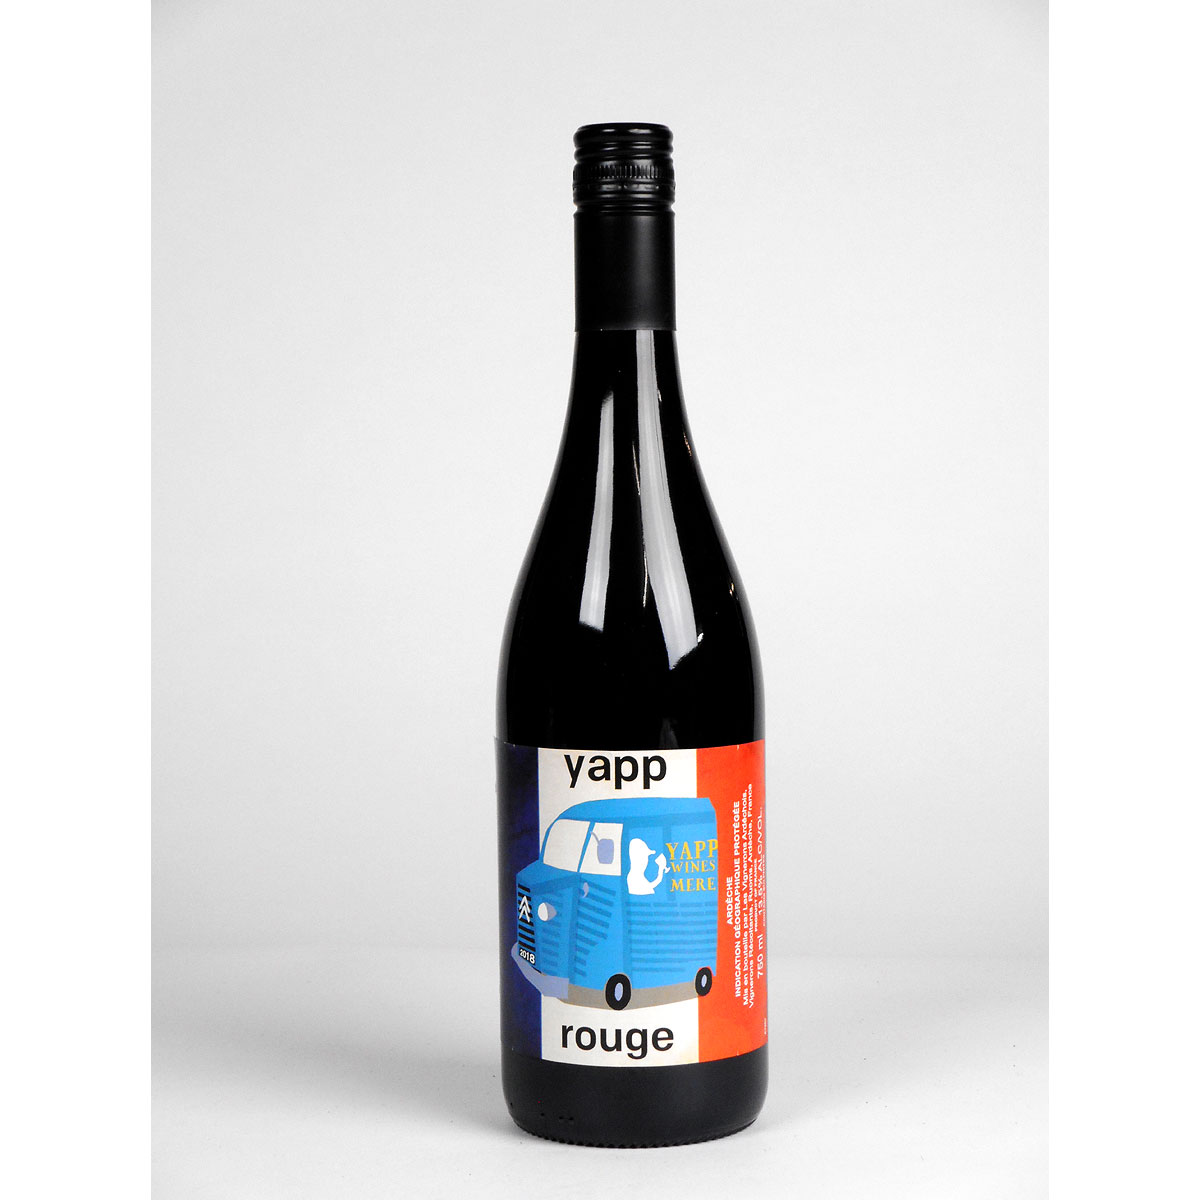 Yapp 'Own Label' Rouge 2018 - Bottle